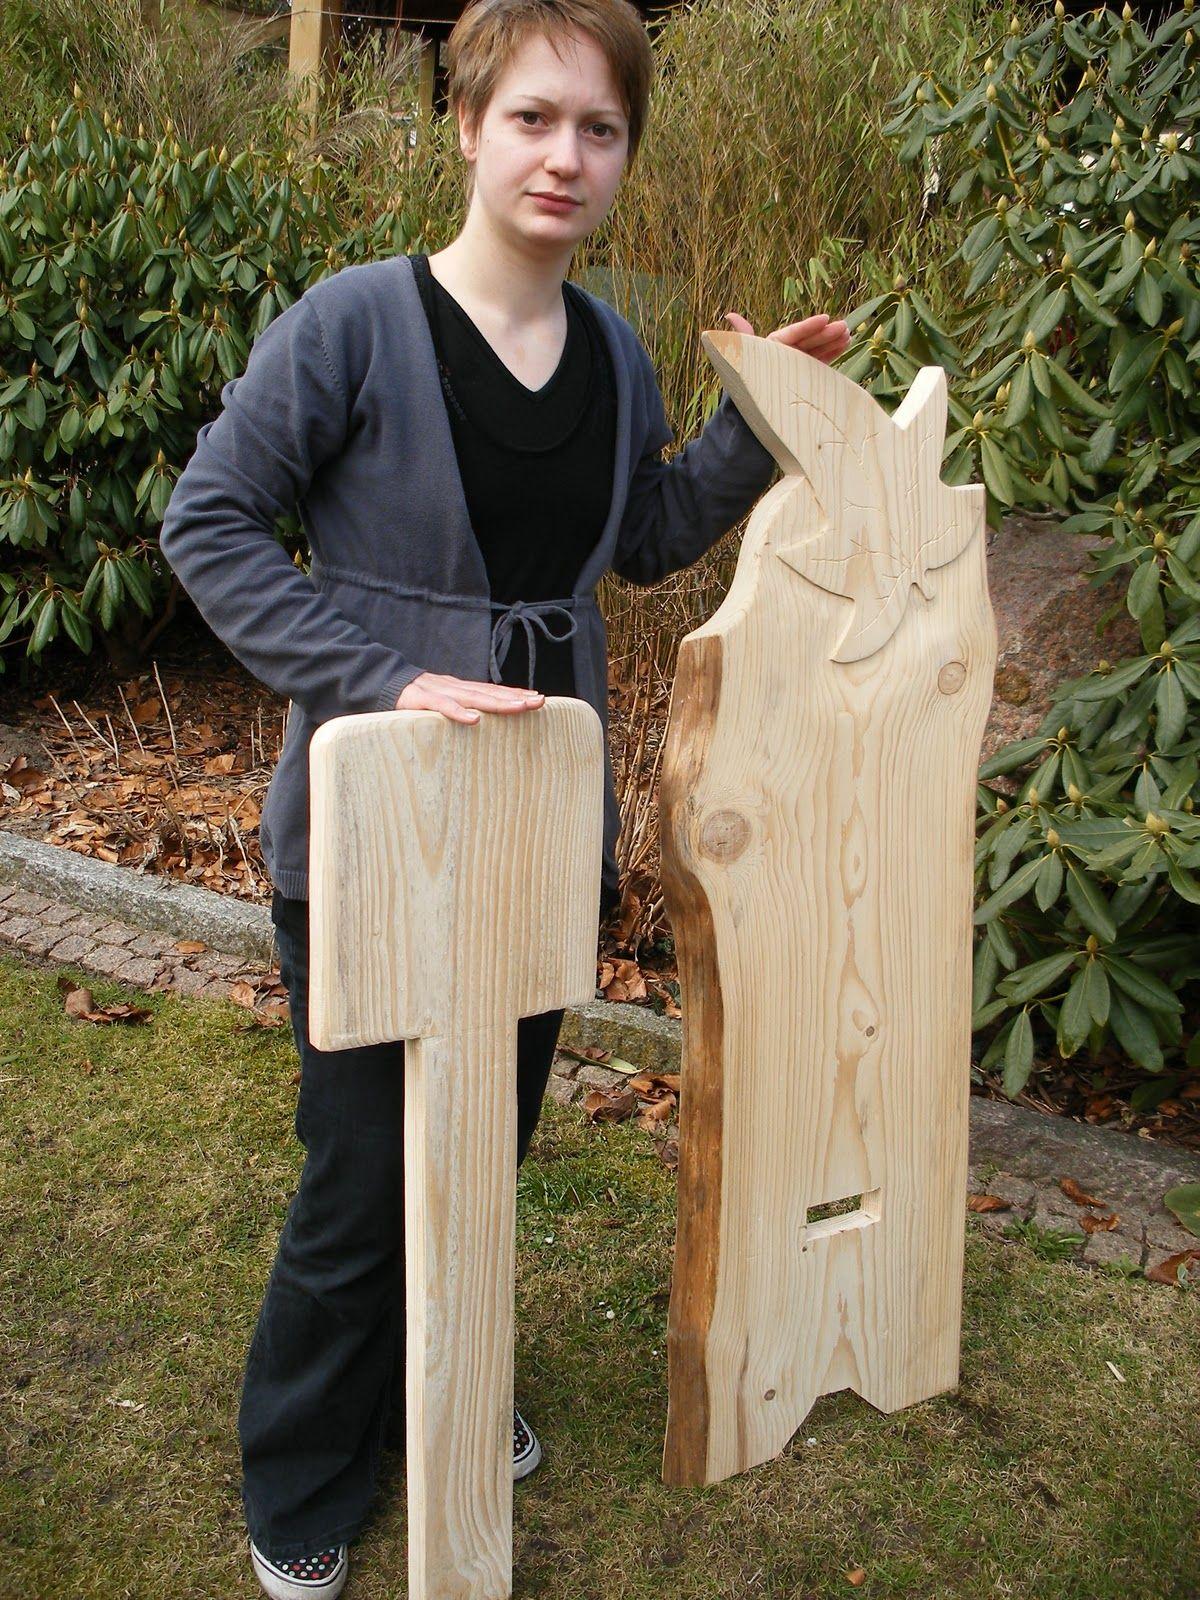 Nora Spinnt Auch Kleine Holzprojekte Sessel Holz Diy Holz